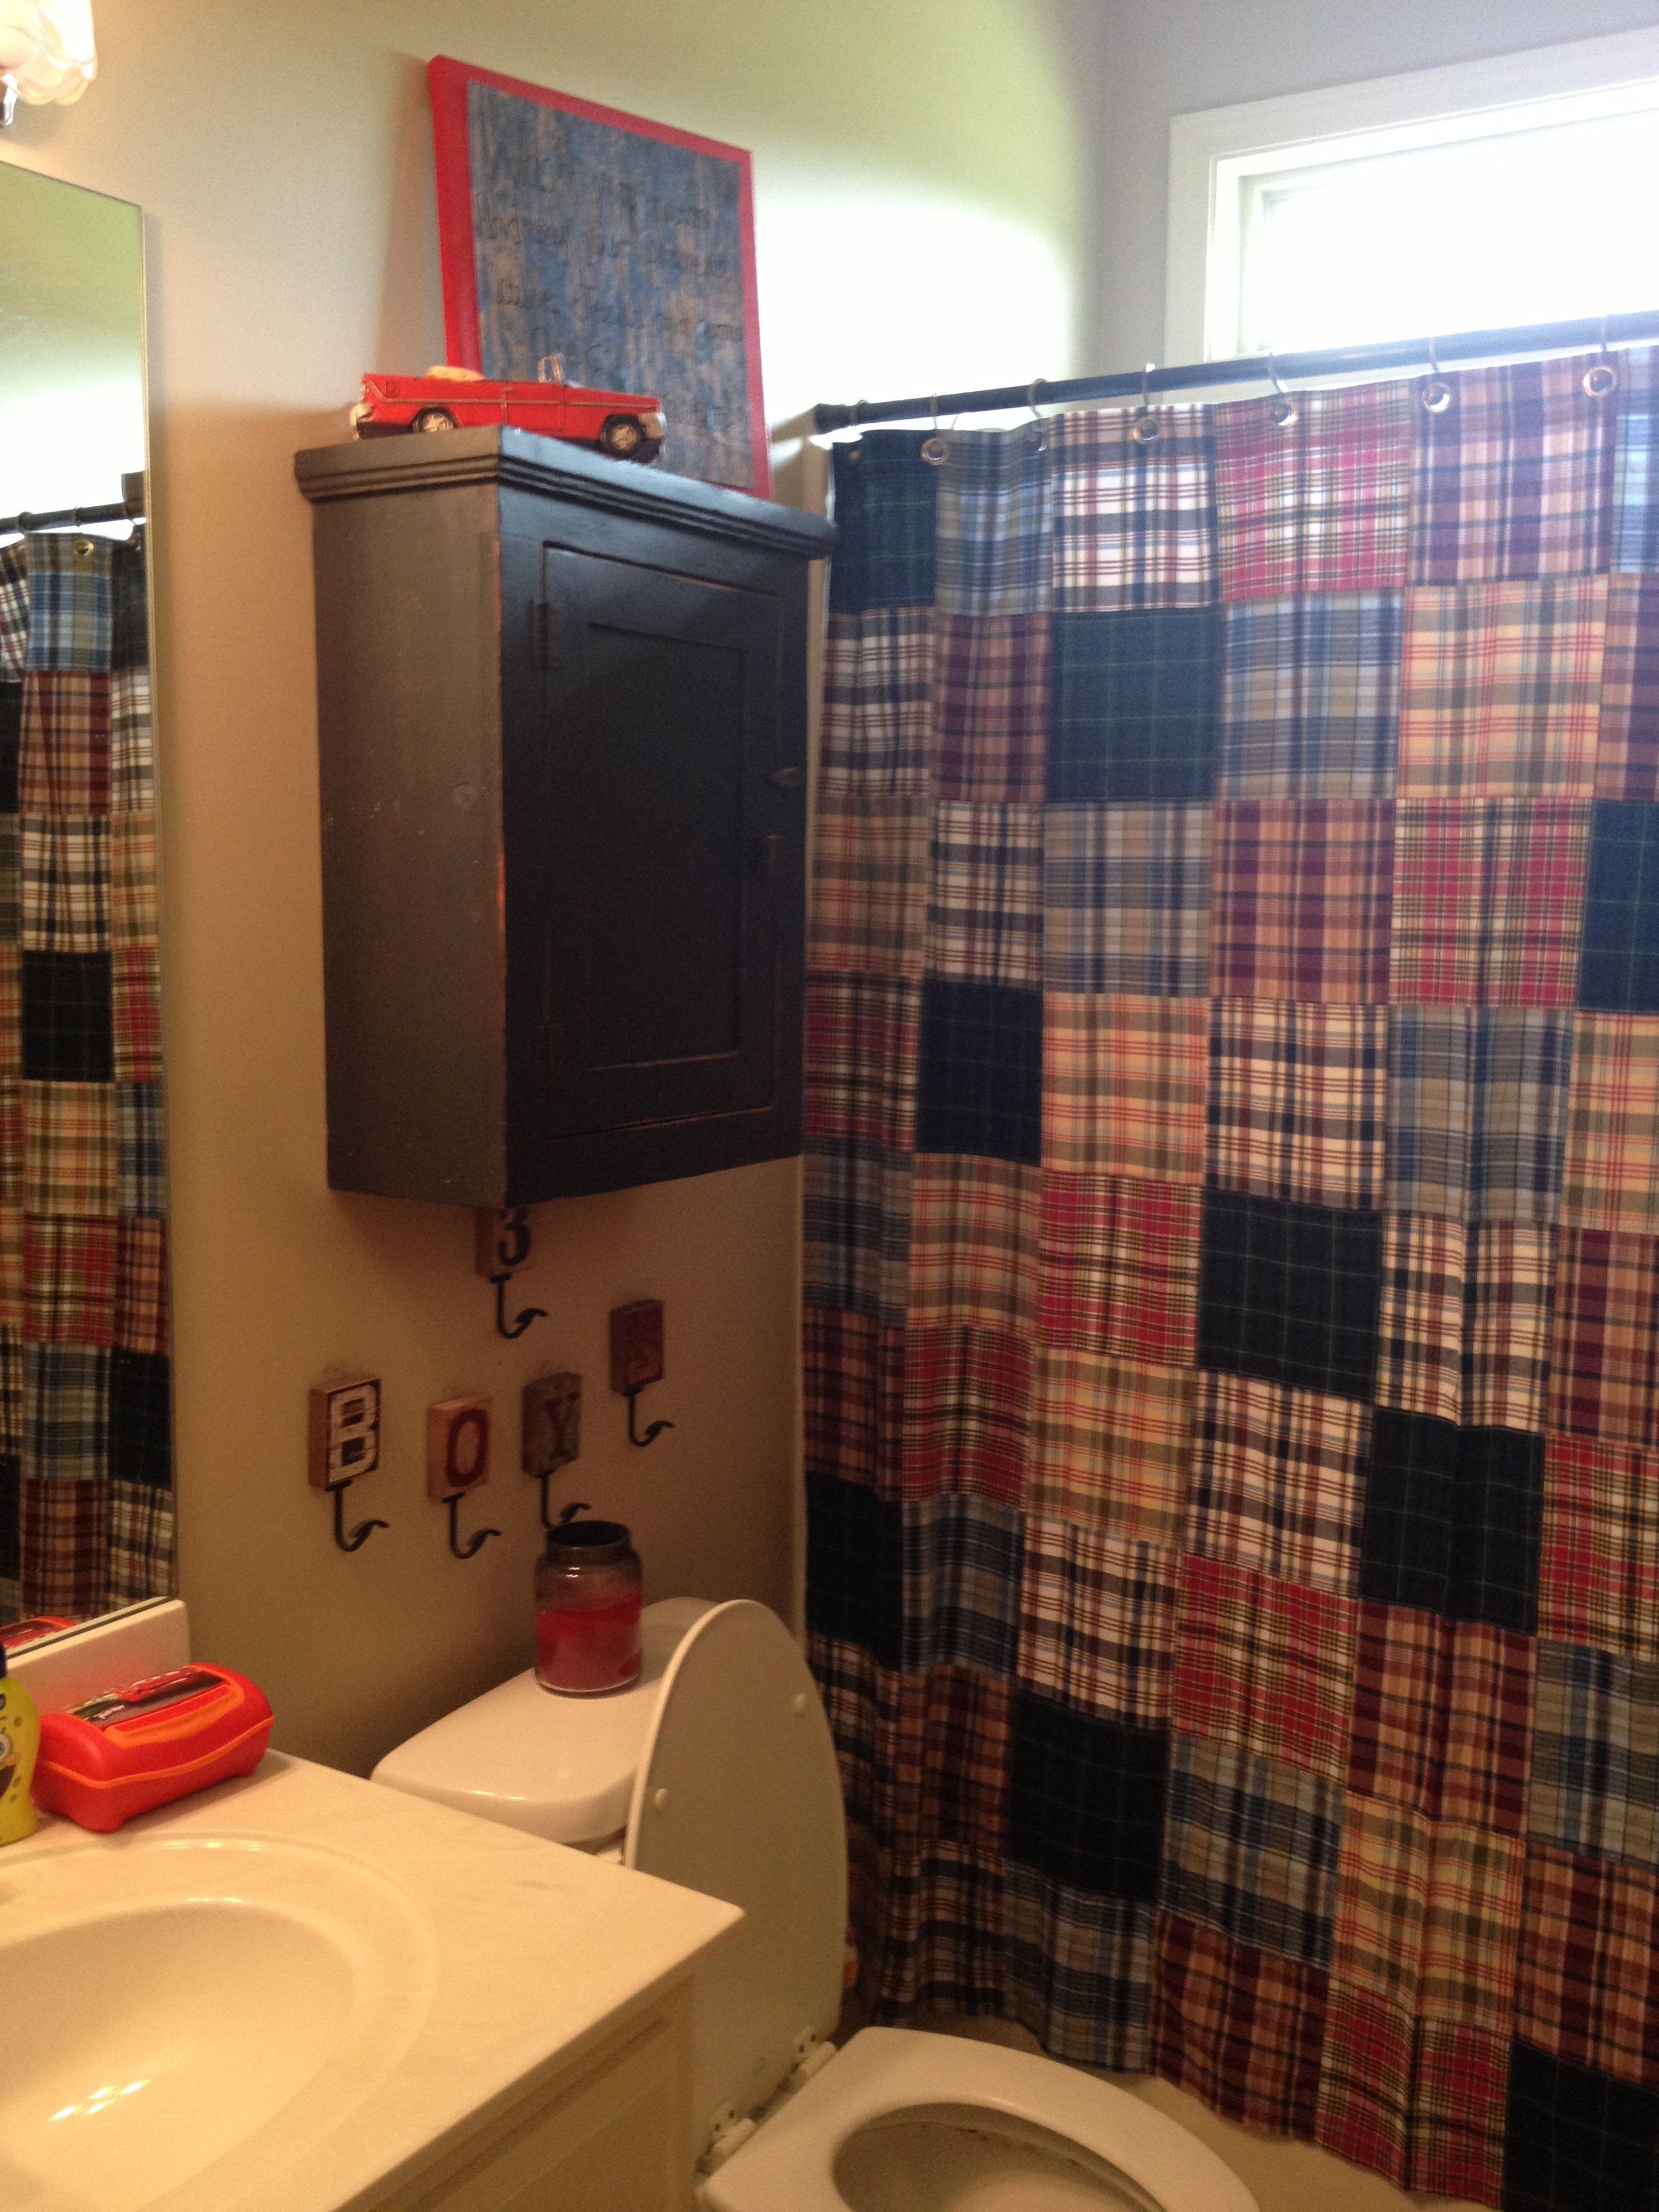 My little boys bathroom | kids | Pinterest | Kid bathrooms, Bath and ...